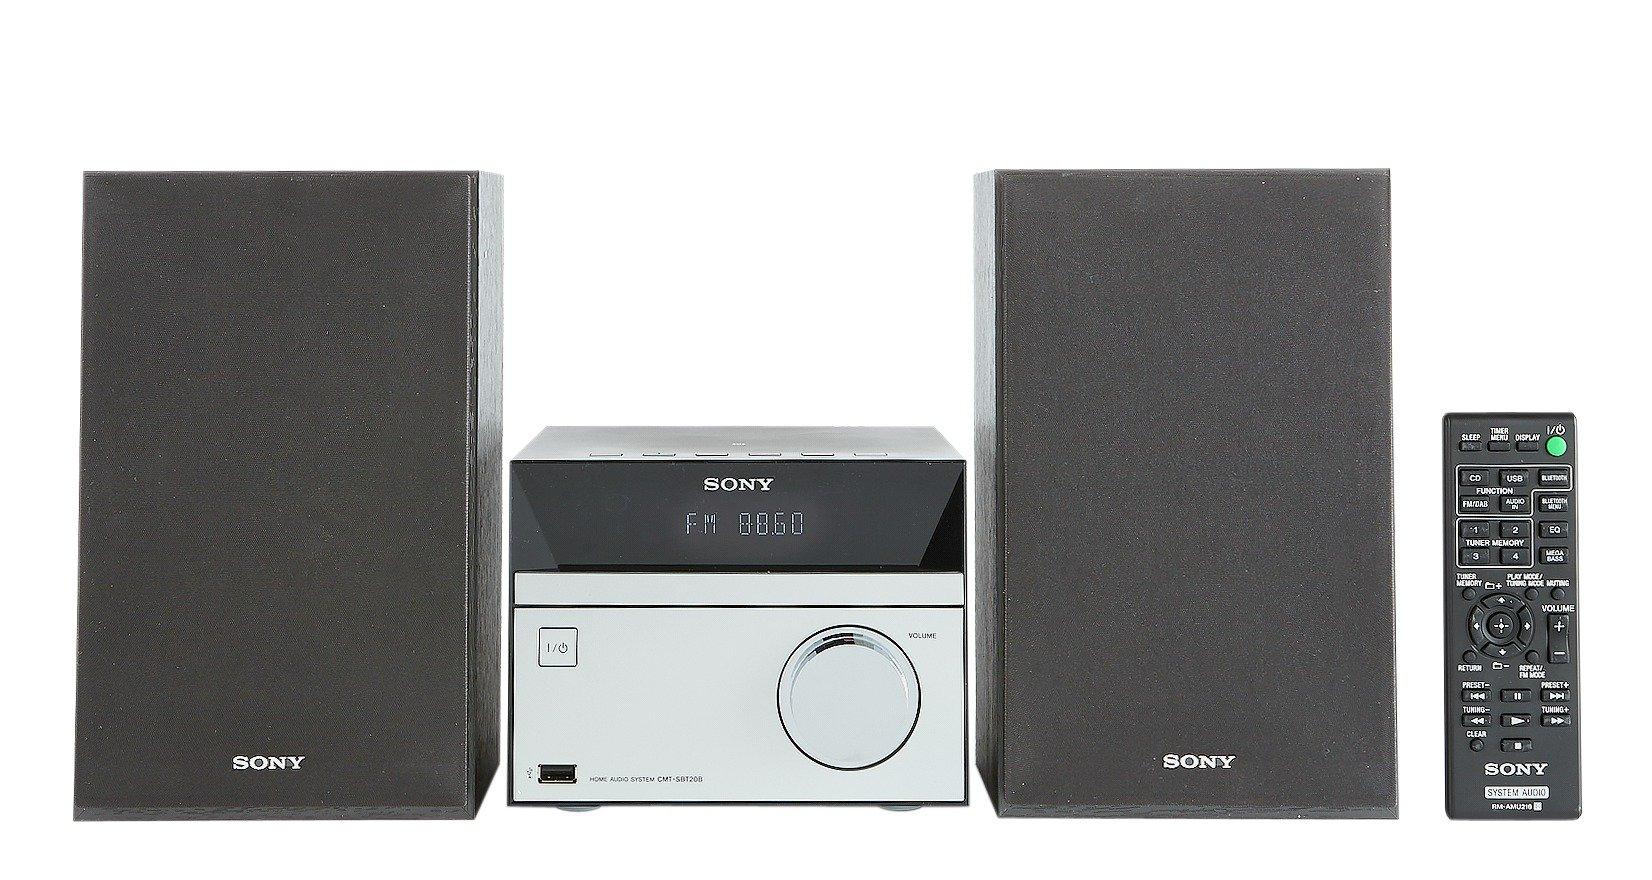 Sony - CMTS20MK2 Micro HiFi System - Black/Silver